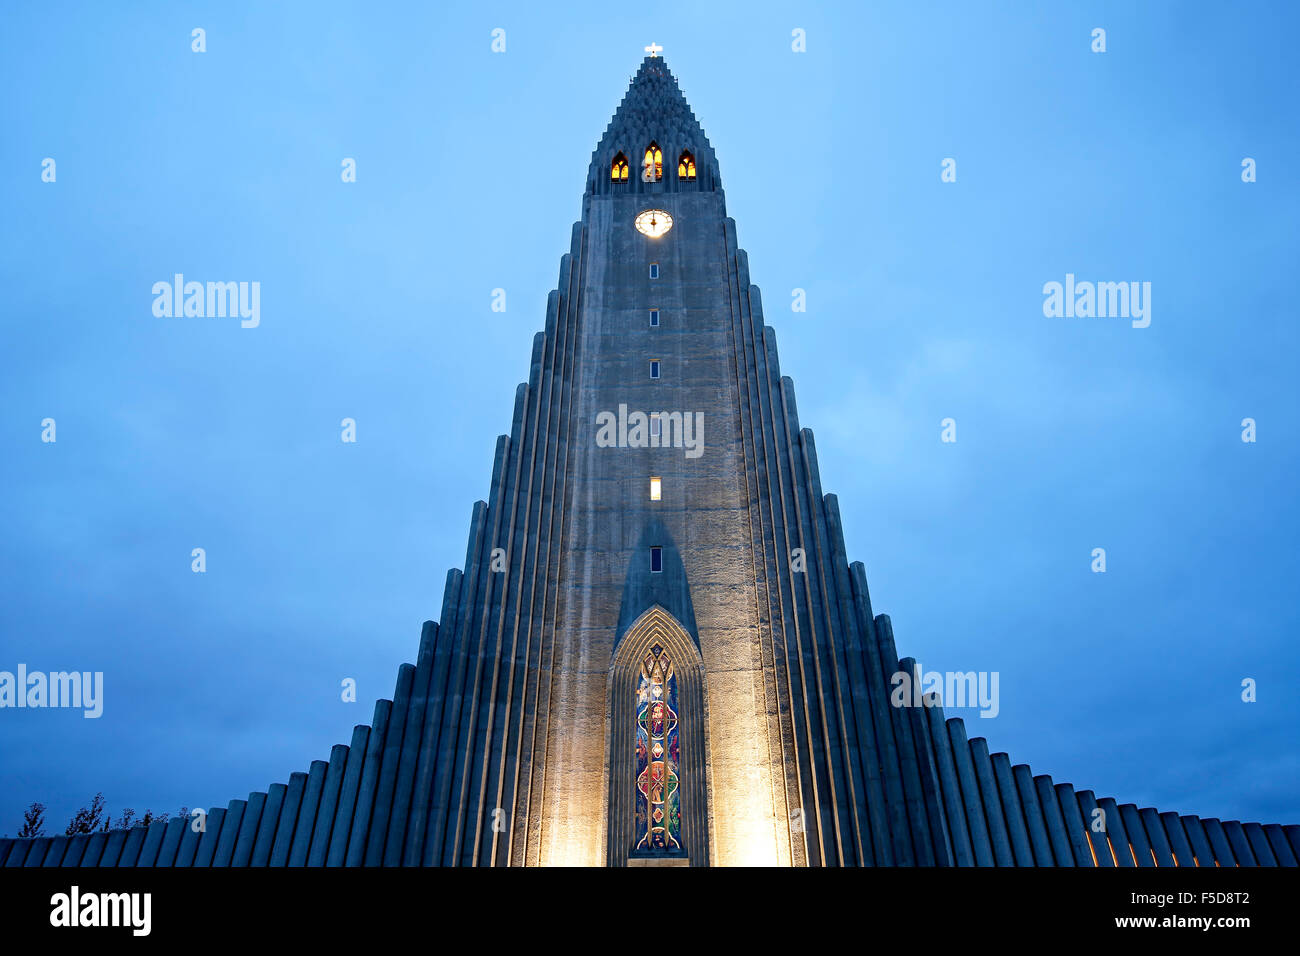 Église Hallgrims Hallgrimskirkja (par architecte d'État Guðjón Samúelsson), Reykjavik, Photo Stock